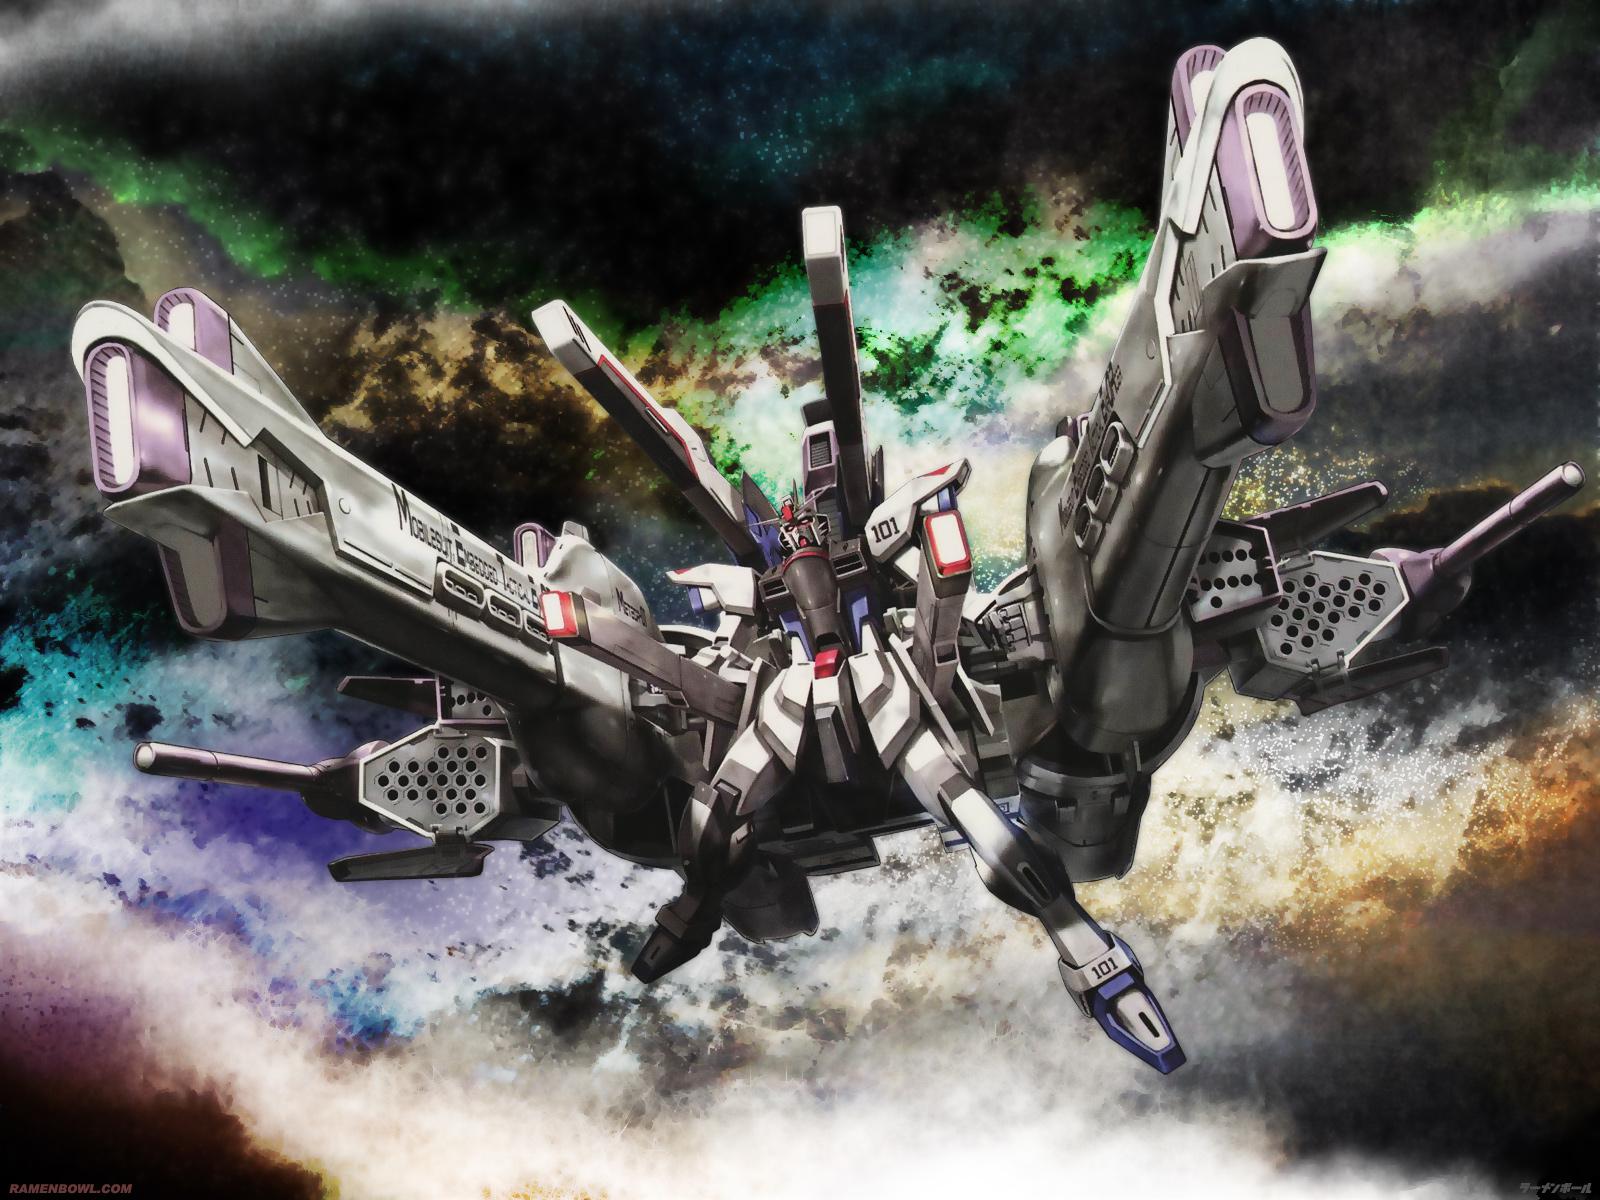 gundam_seed mecha mobile_suit_gundam robot